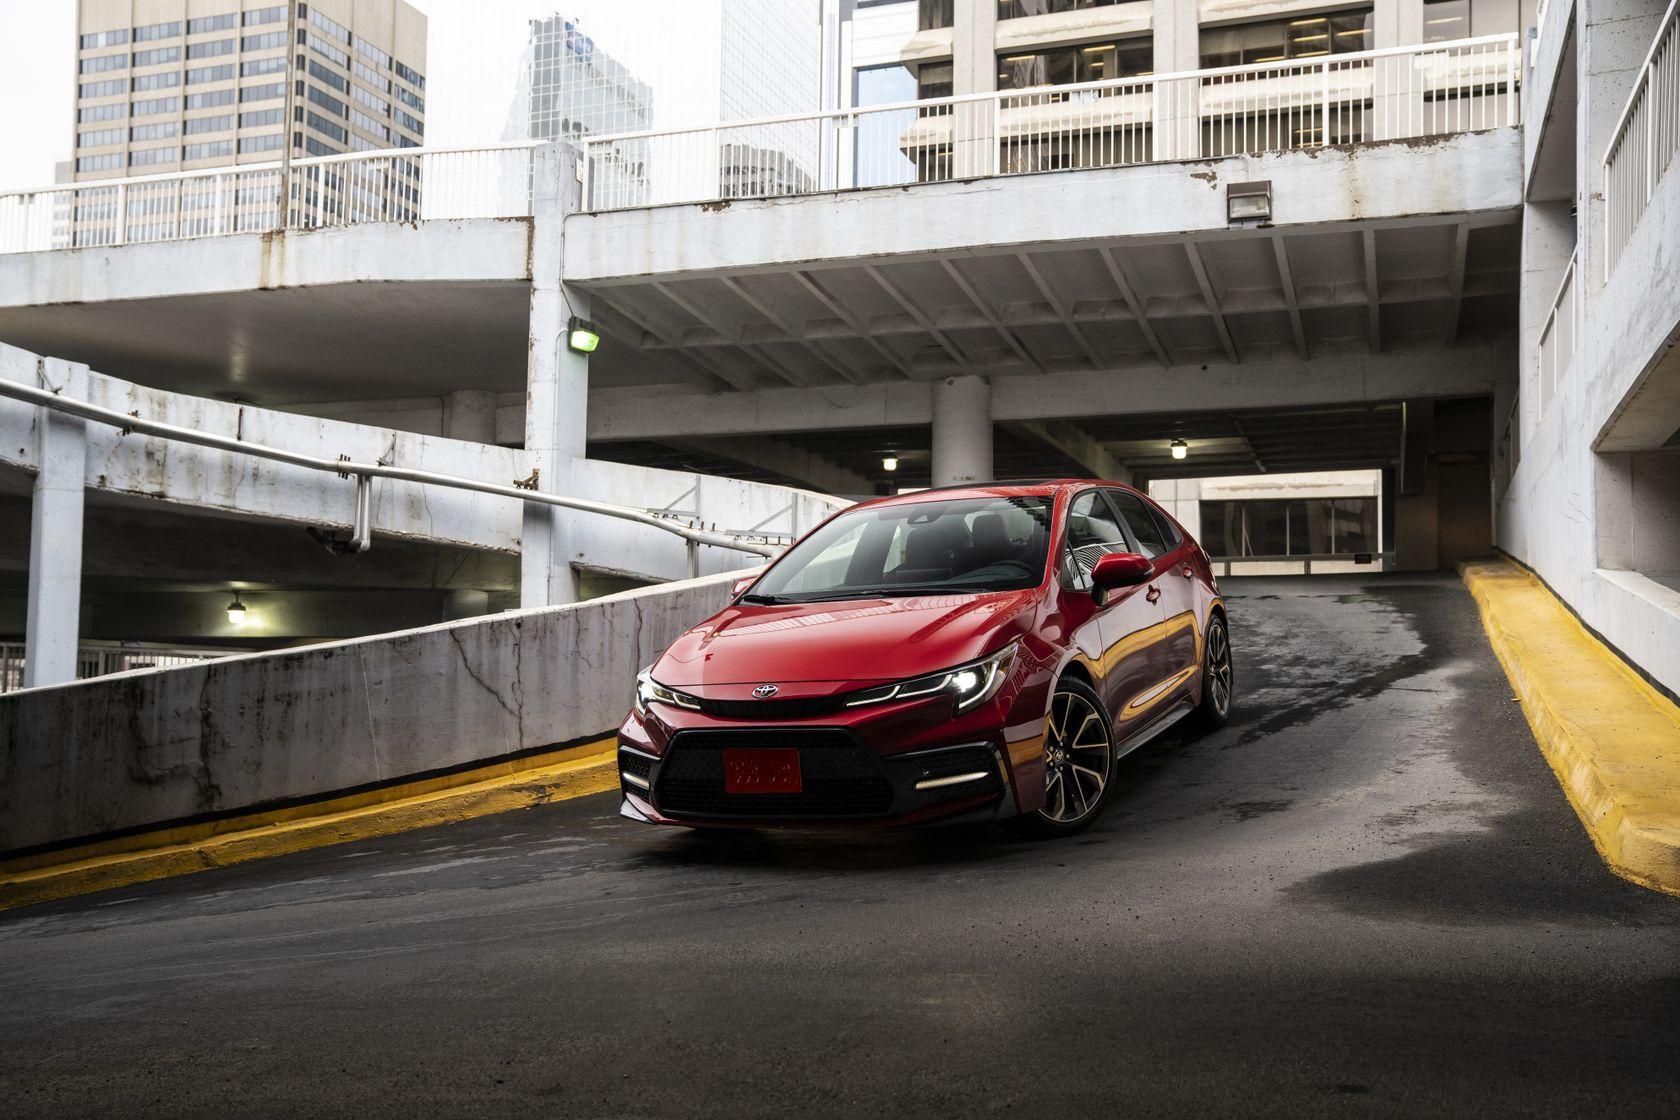 Toyota Corolla 2020 rouge descend une pente